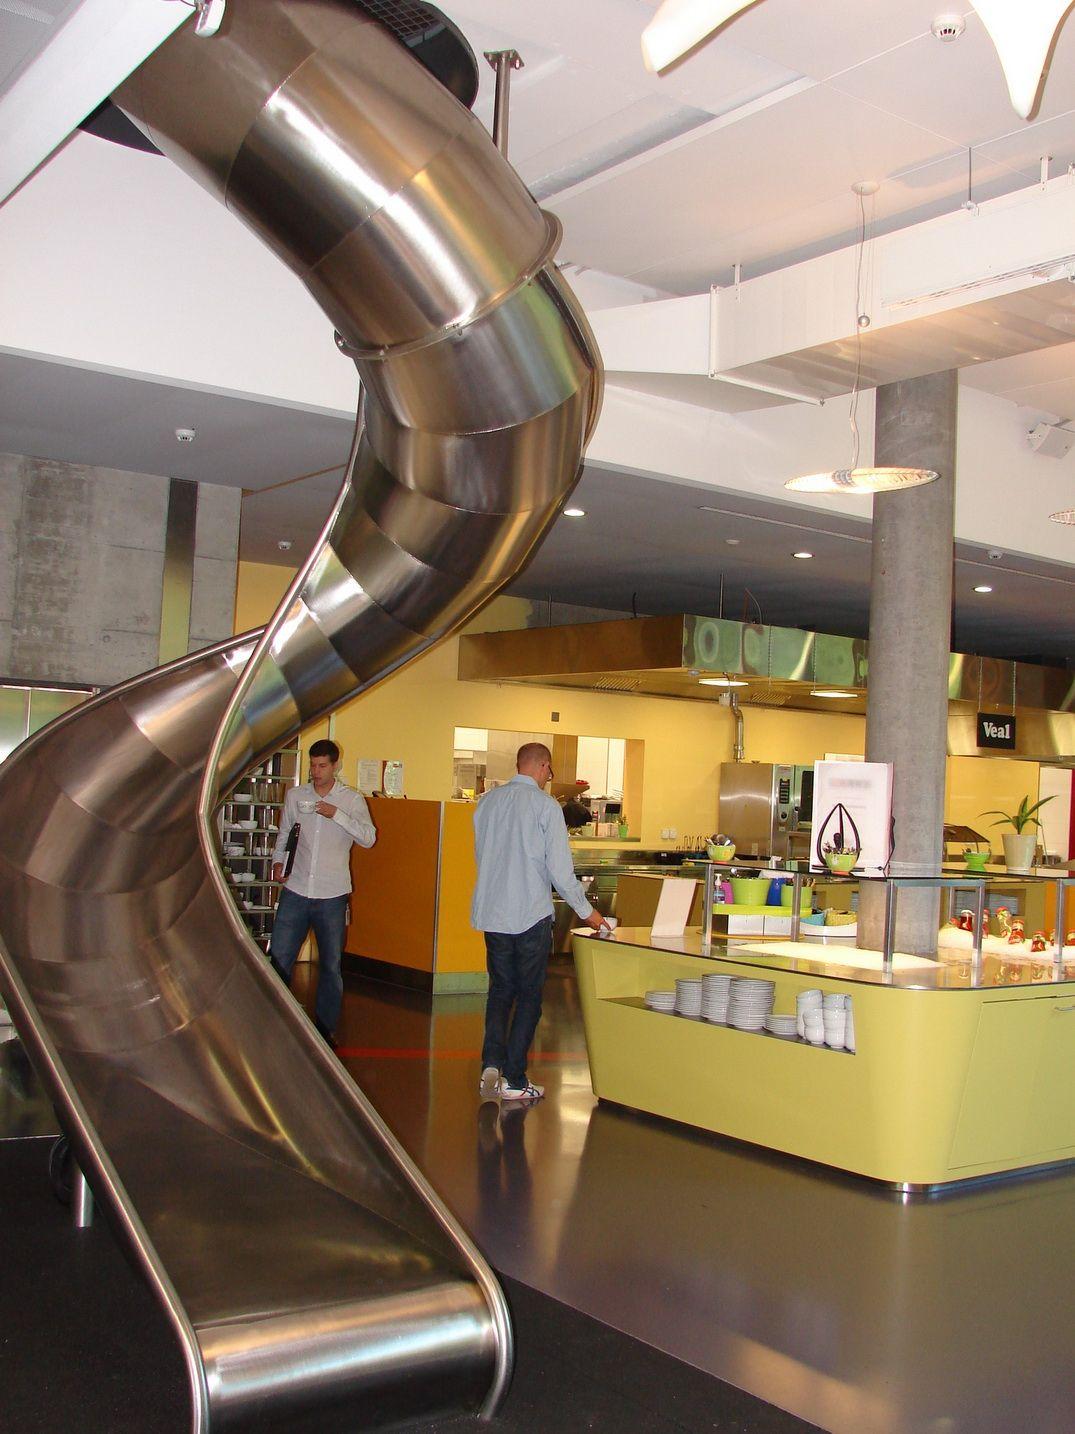 google office cafeteria. corporate cafeteria google search office f